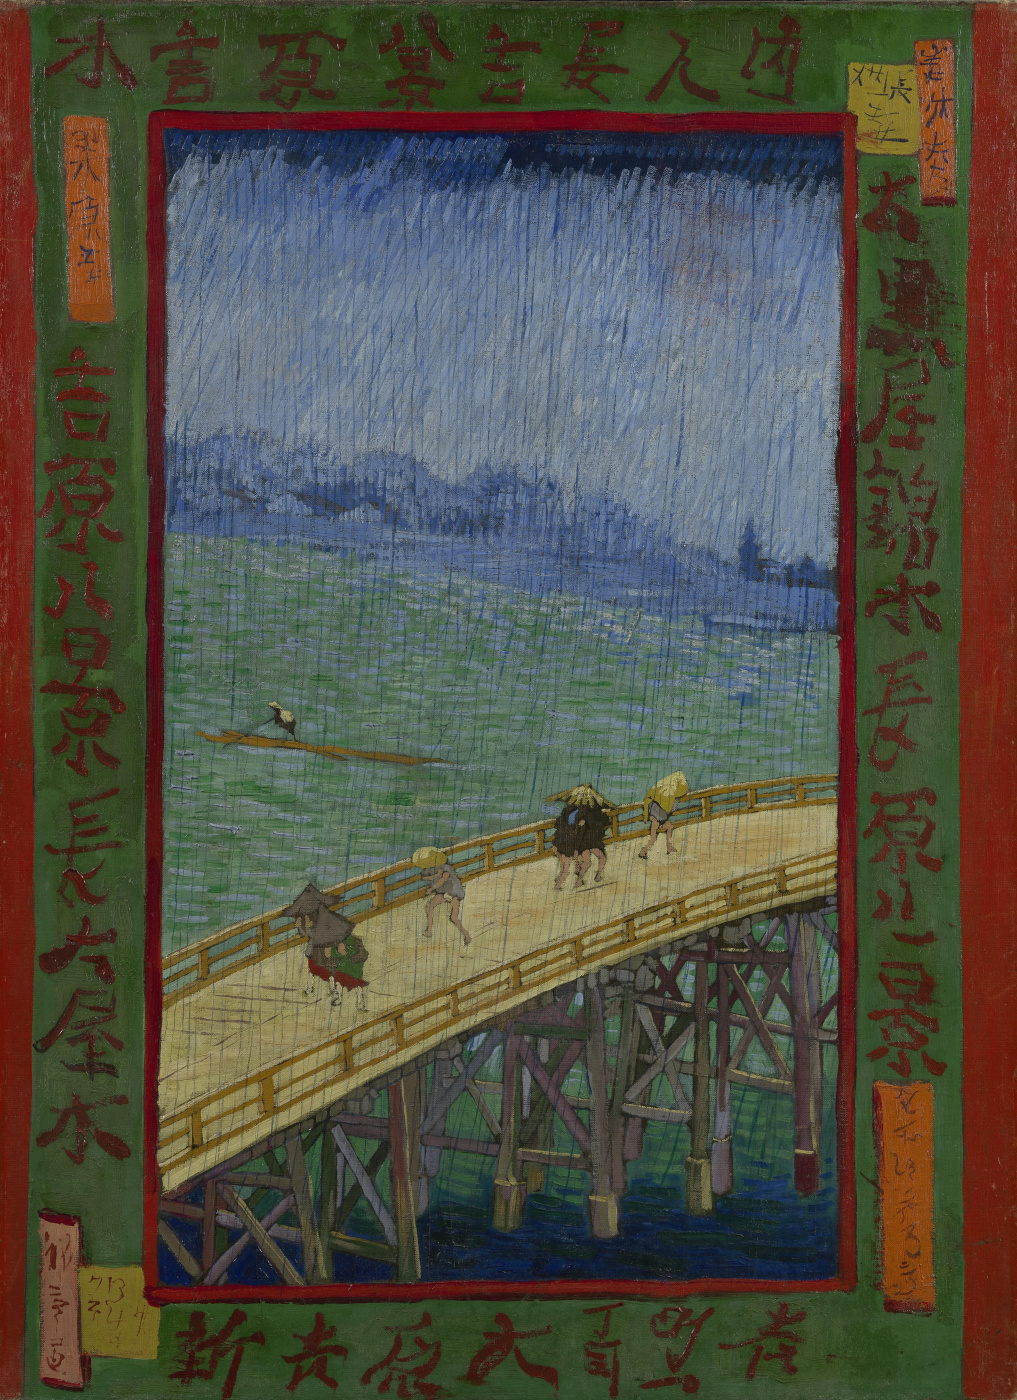 Vincent van Gogh. Bridge in the rain (inspired by Hiroshige)